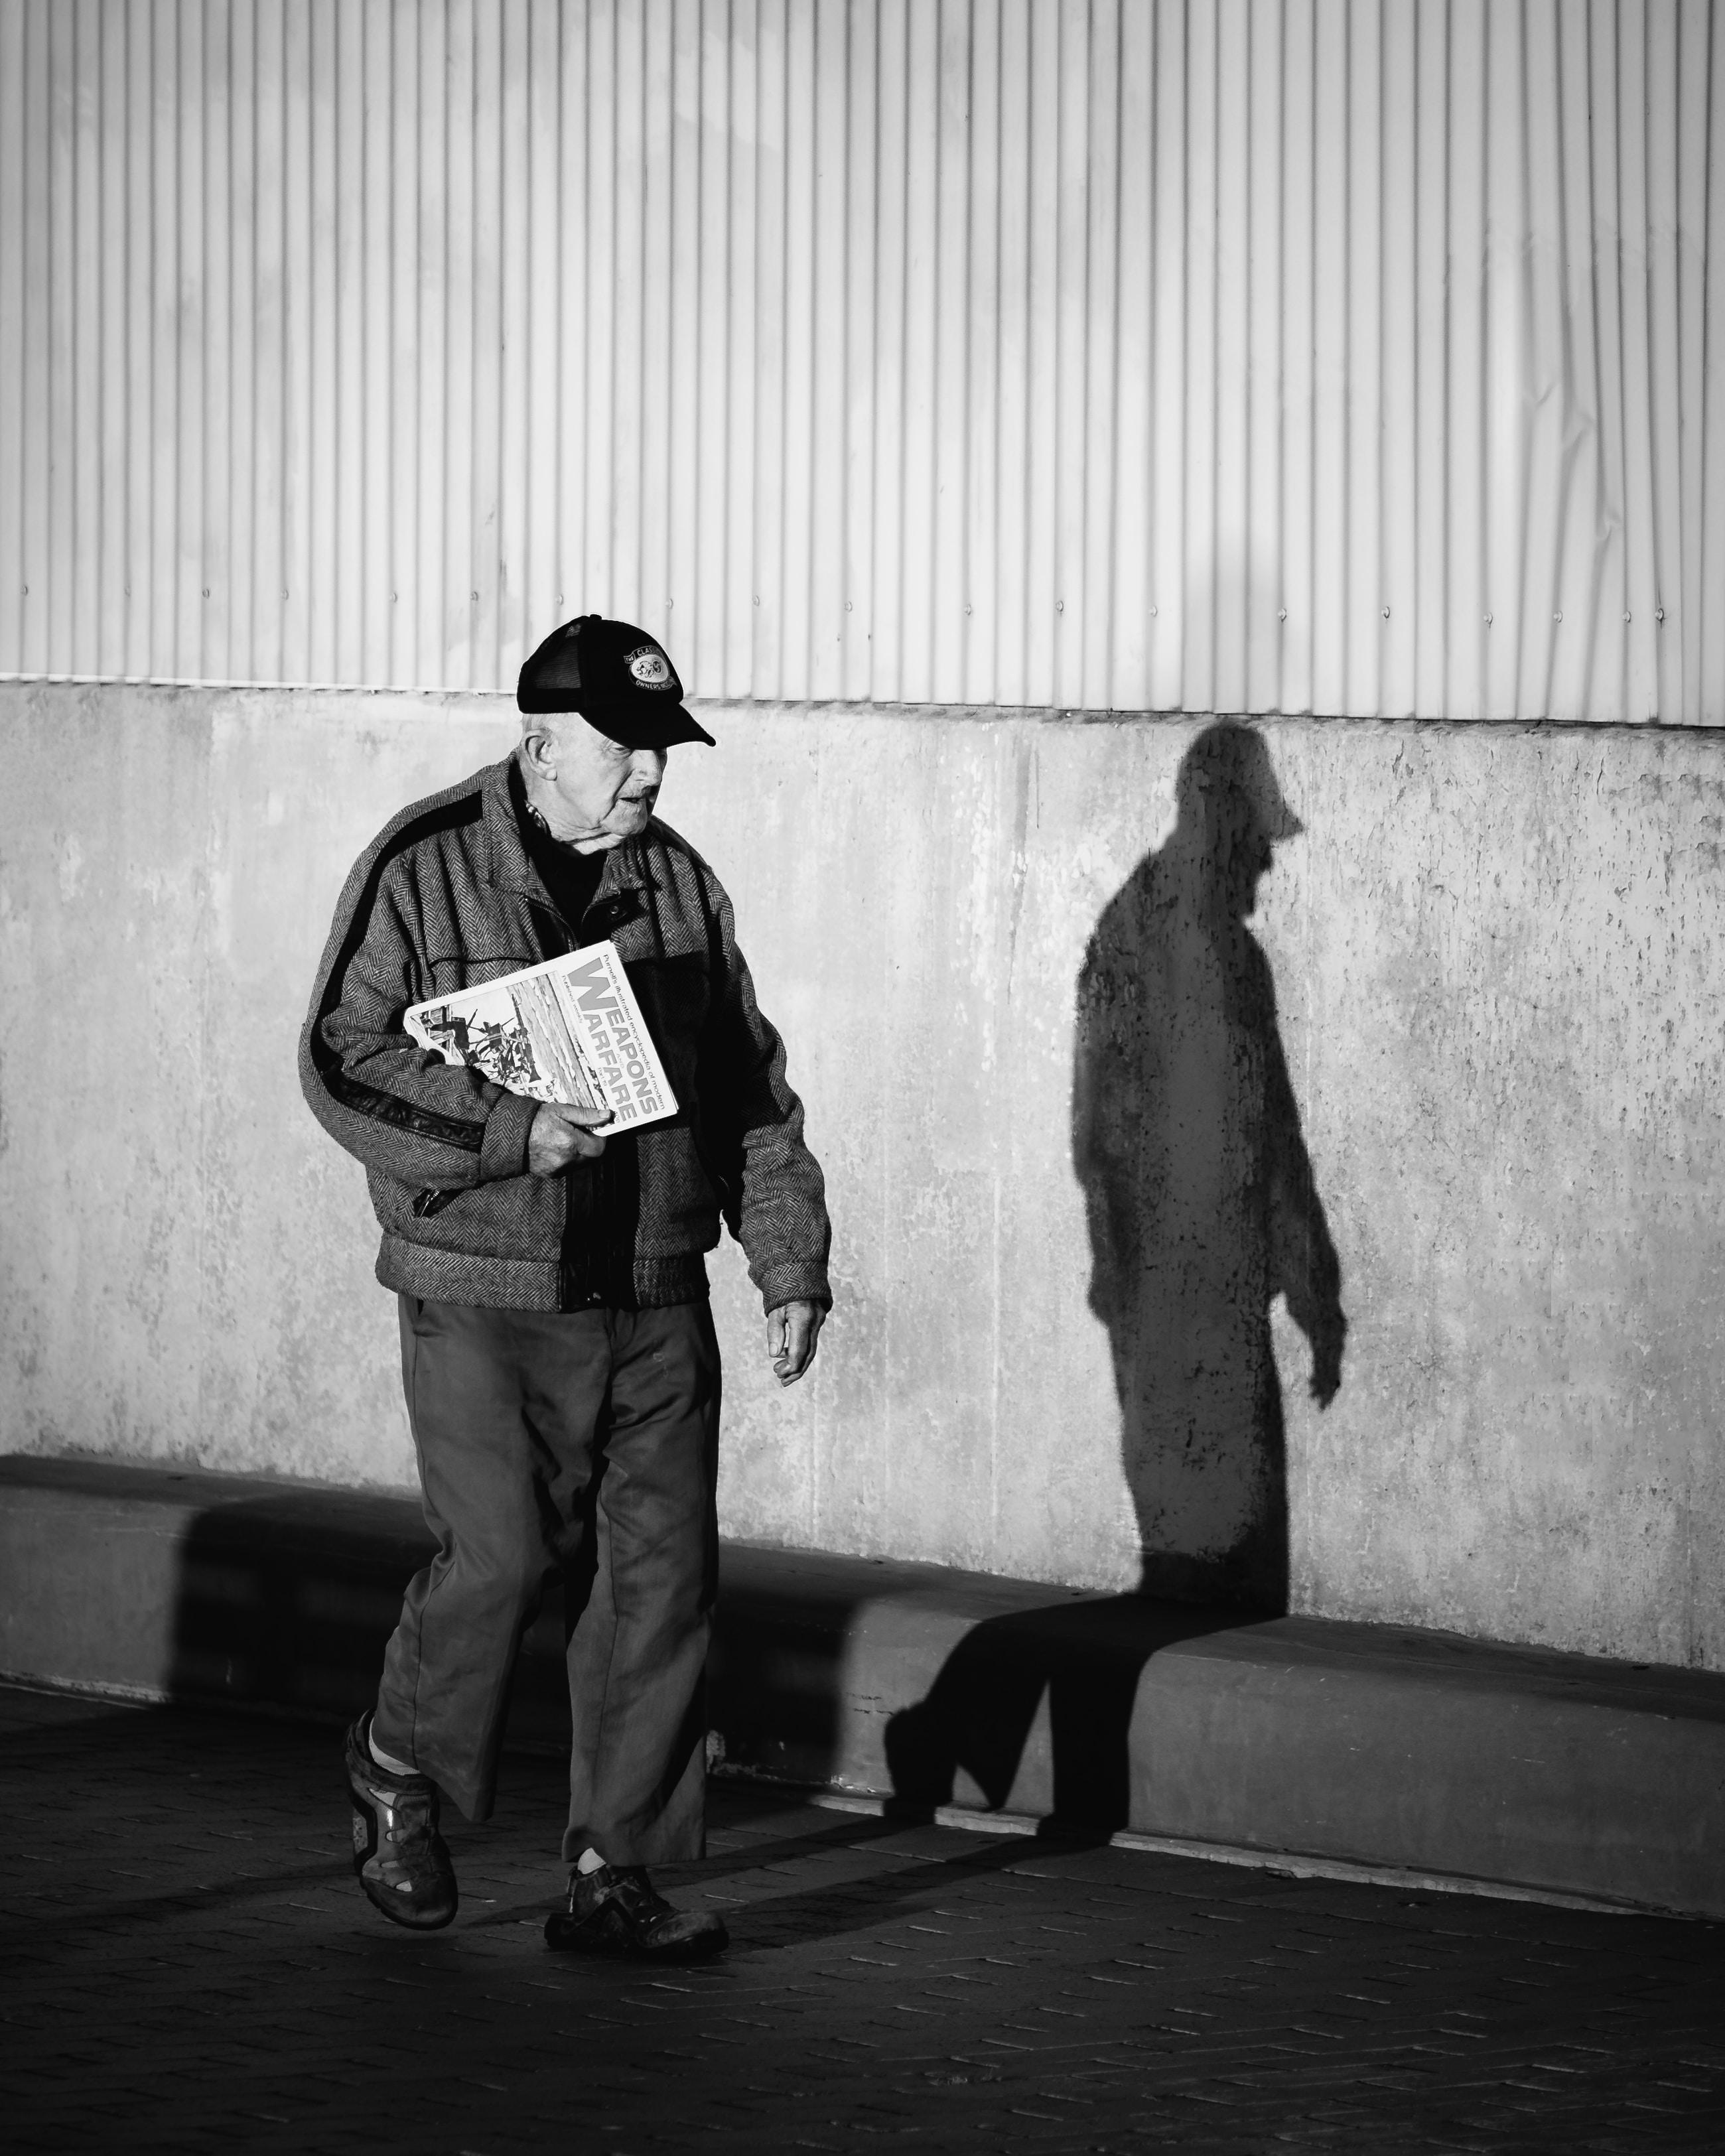 man walking on the sidewalk